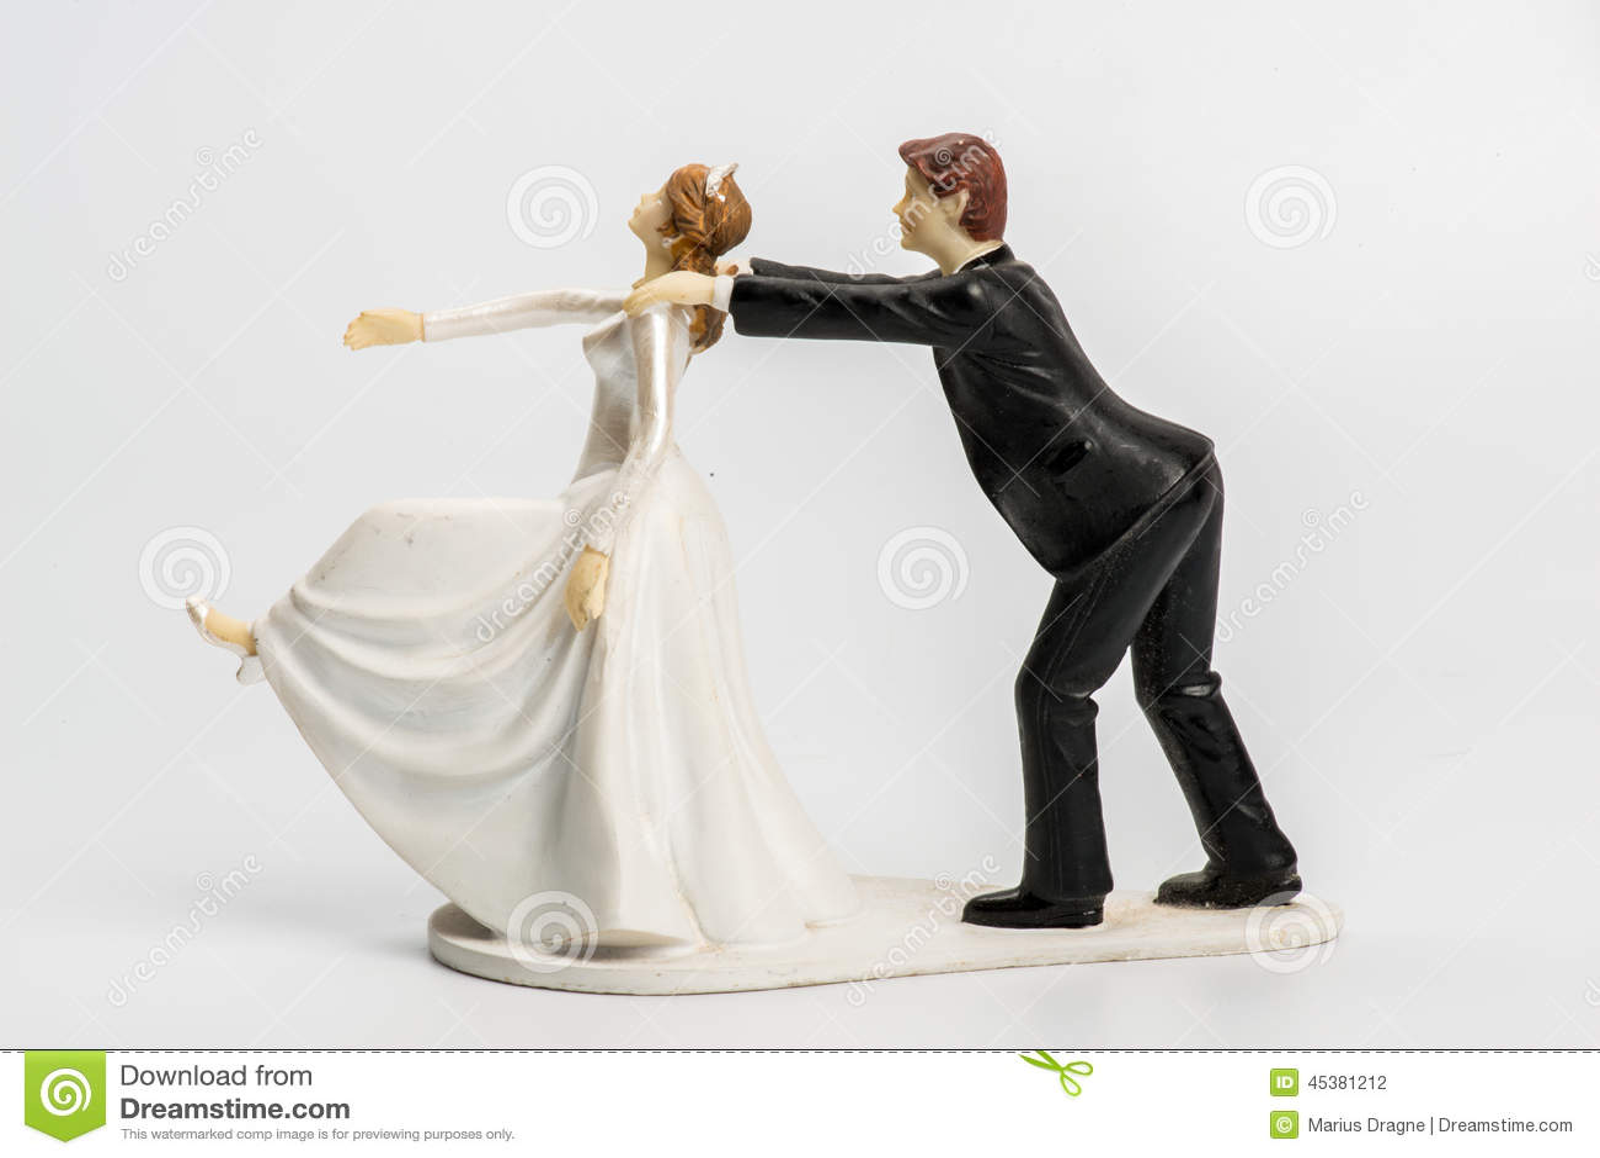 stock images couple wedding cake topper image wedding cake topper Couple wedding cake topper isolated Stock Photography